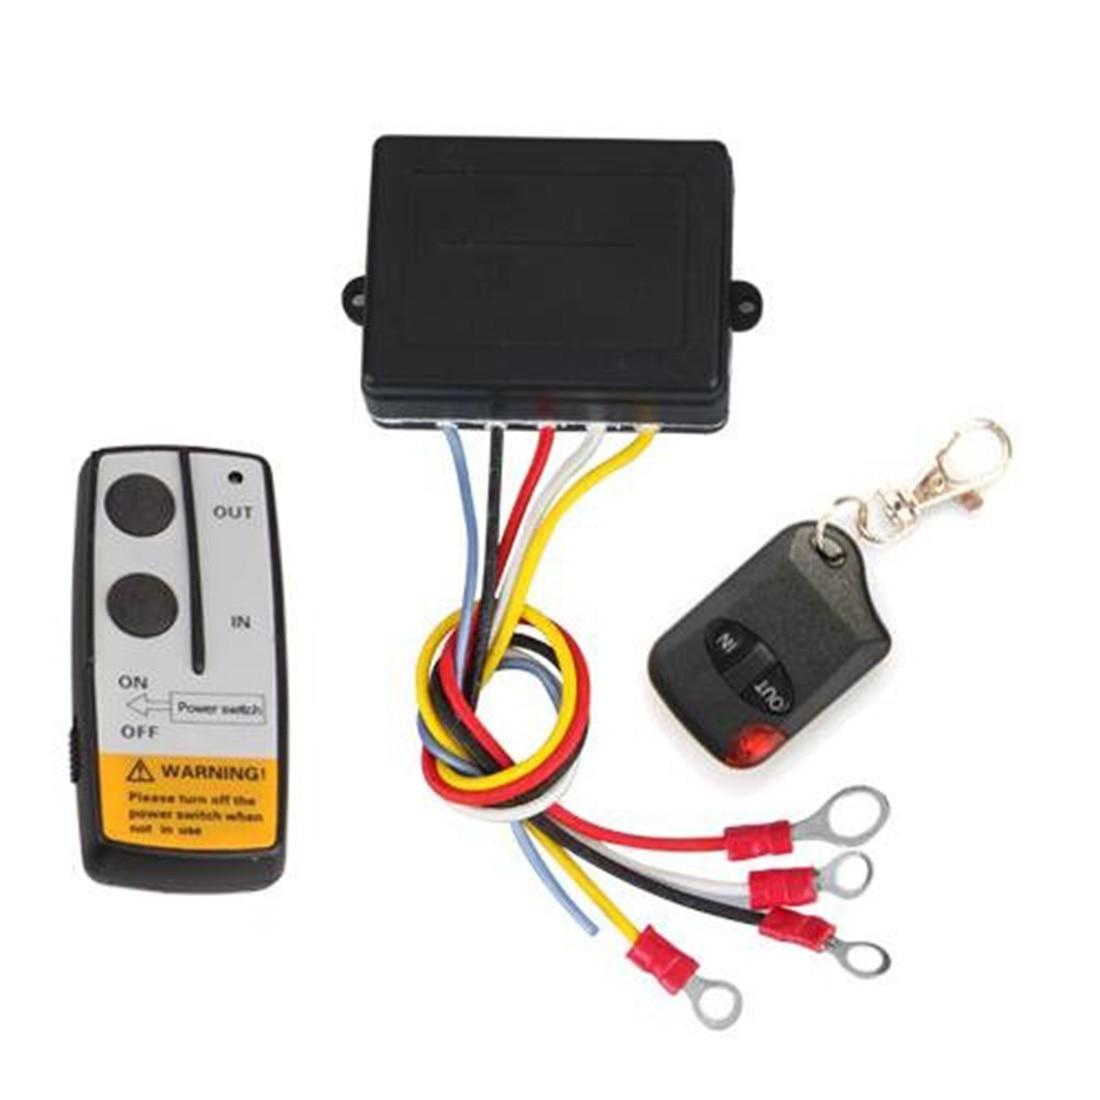 Marsnaska 2017 hot sale 12V 50ft Winch Wireless Remote Control Set Kit For Truck Jeep ATV Warn Ramsey